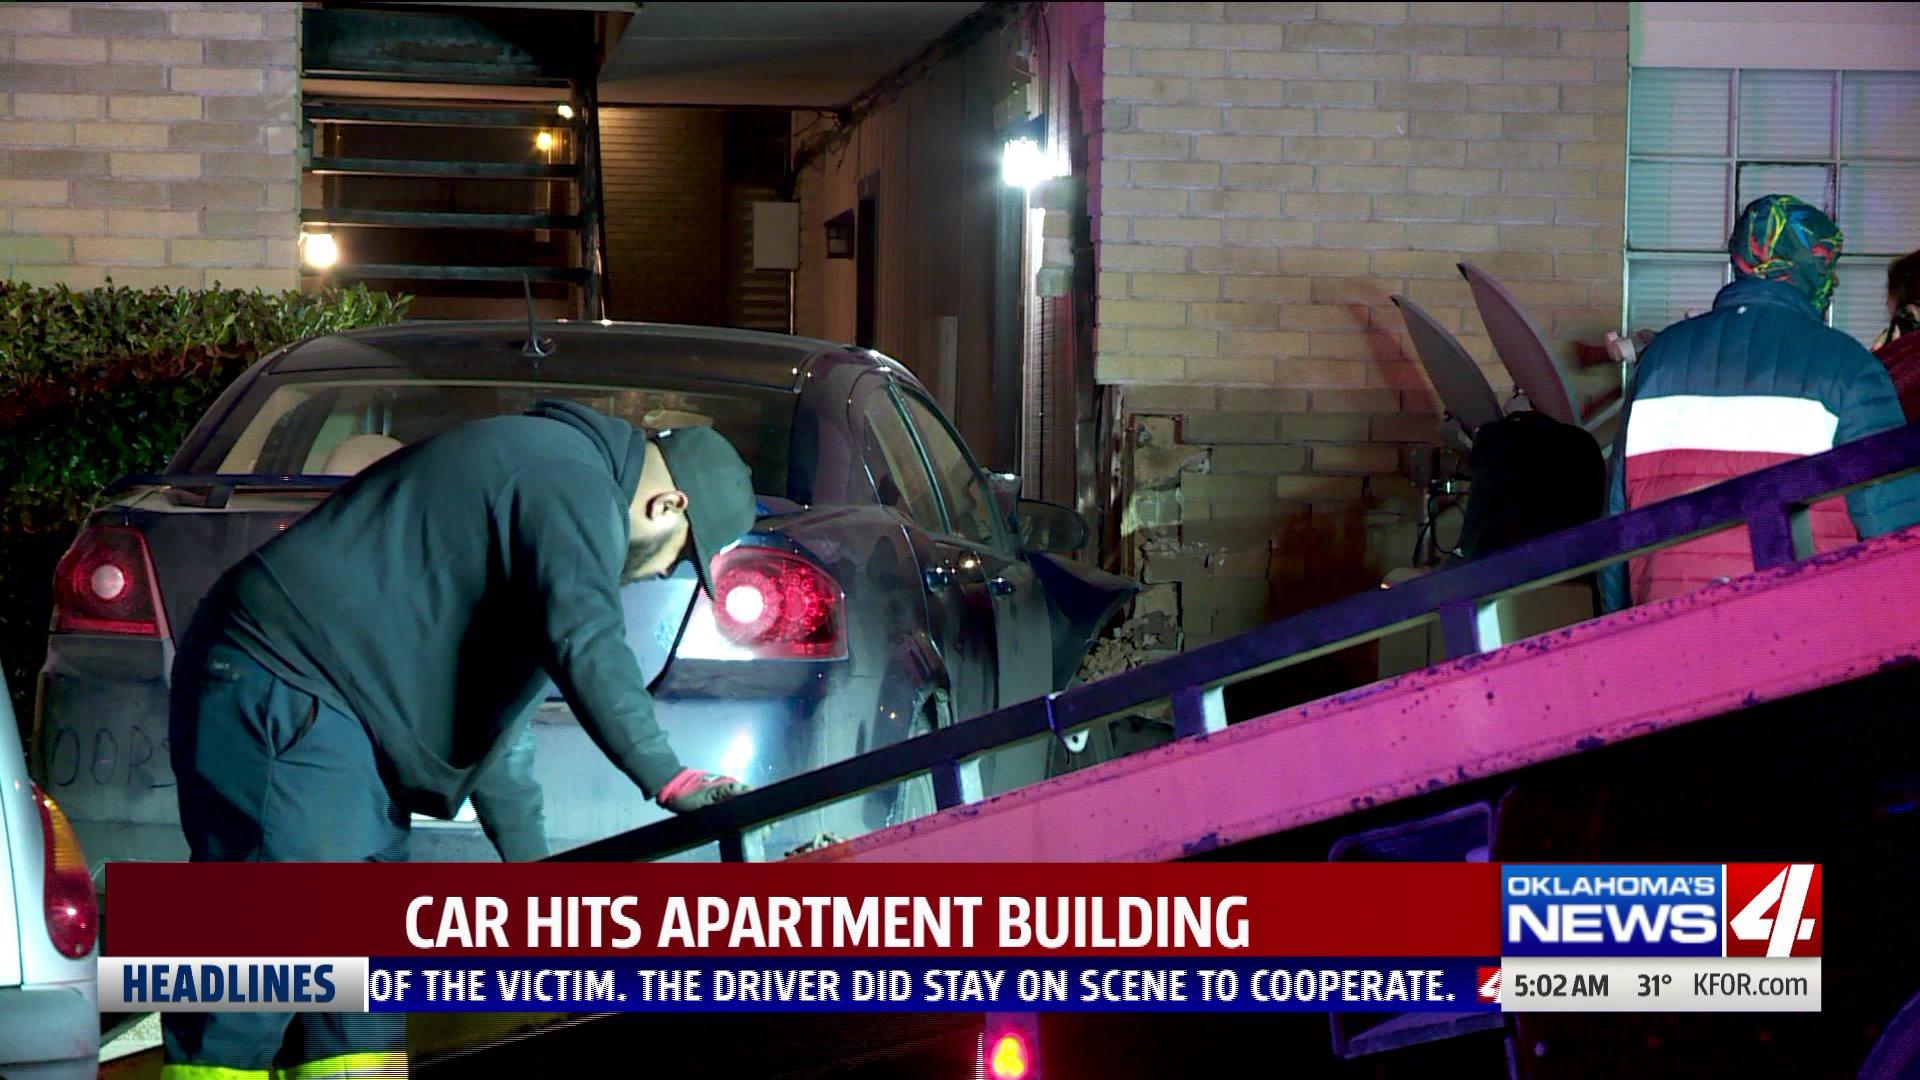 Car crashes into apartment building